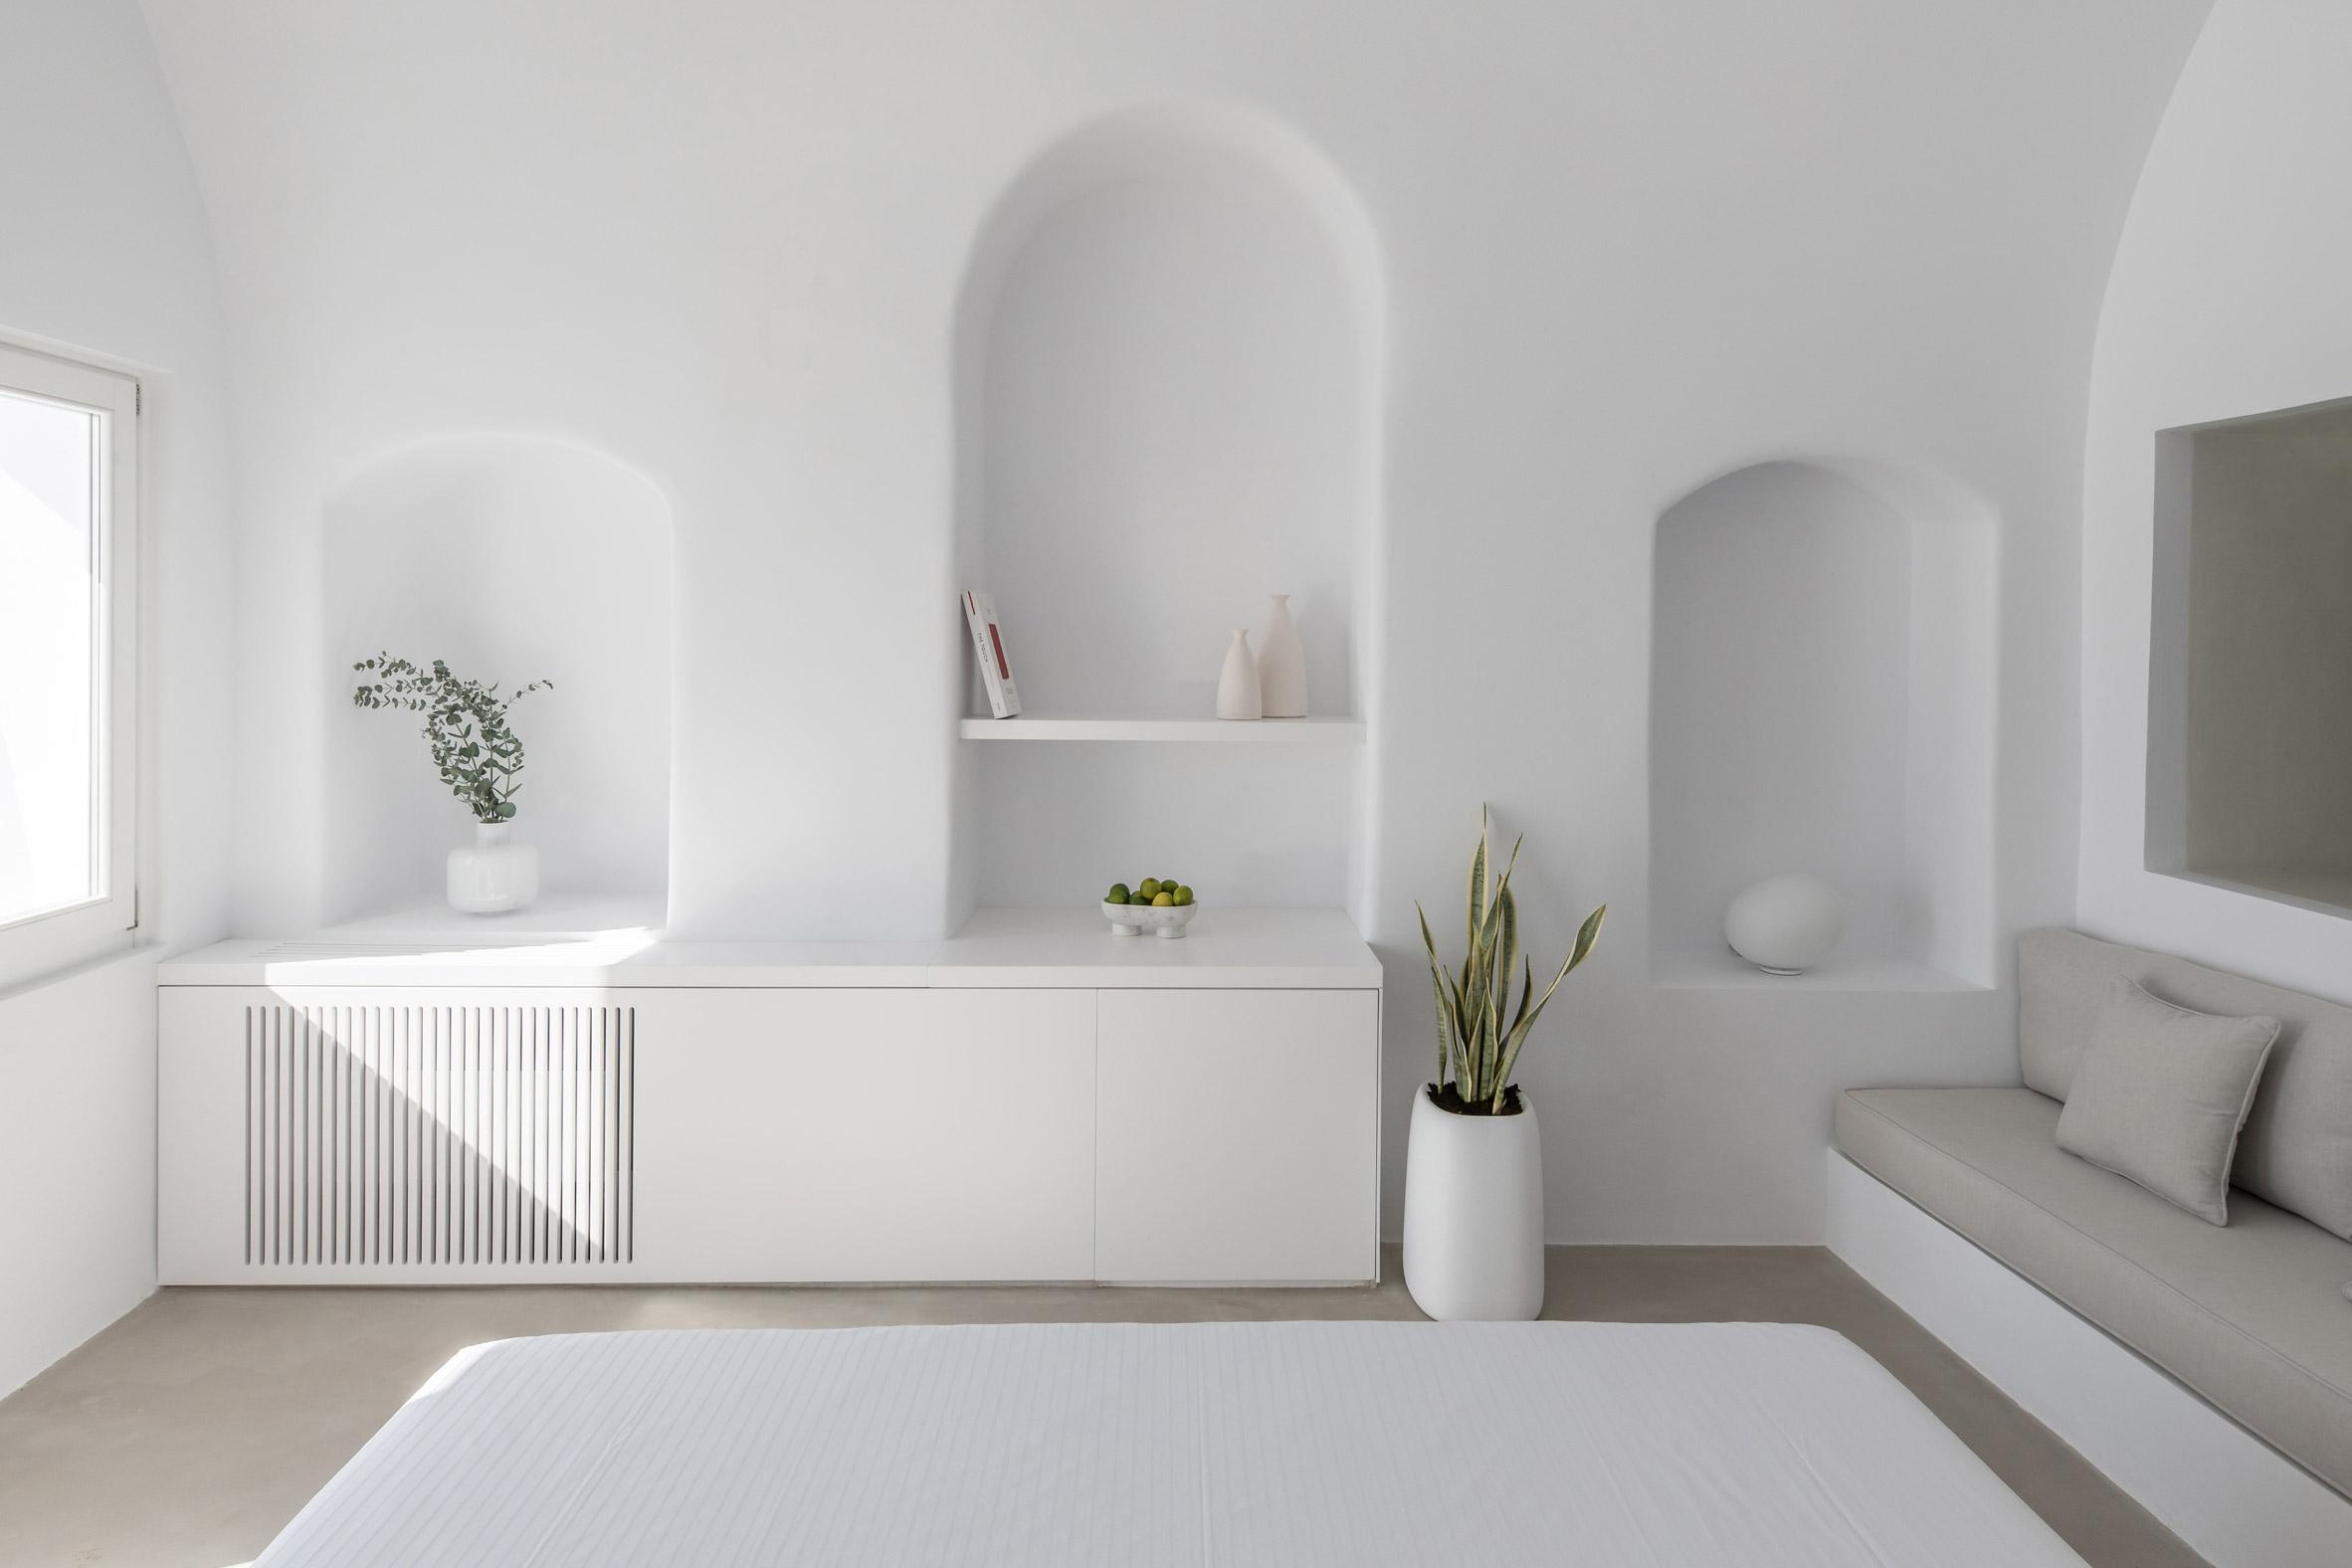 12_Saint Hotel_Kapsimalis Architects_Inspirationist